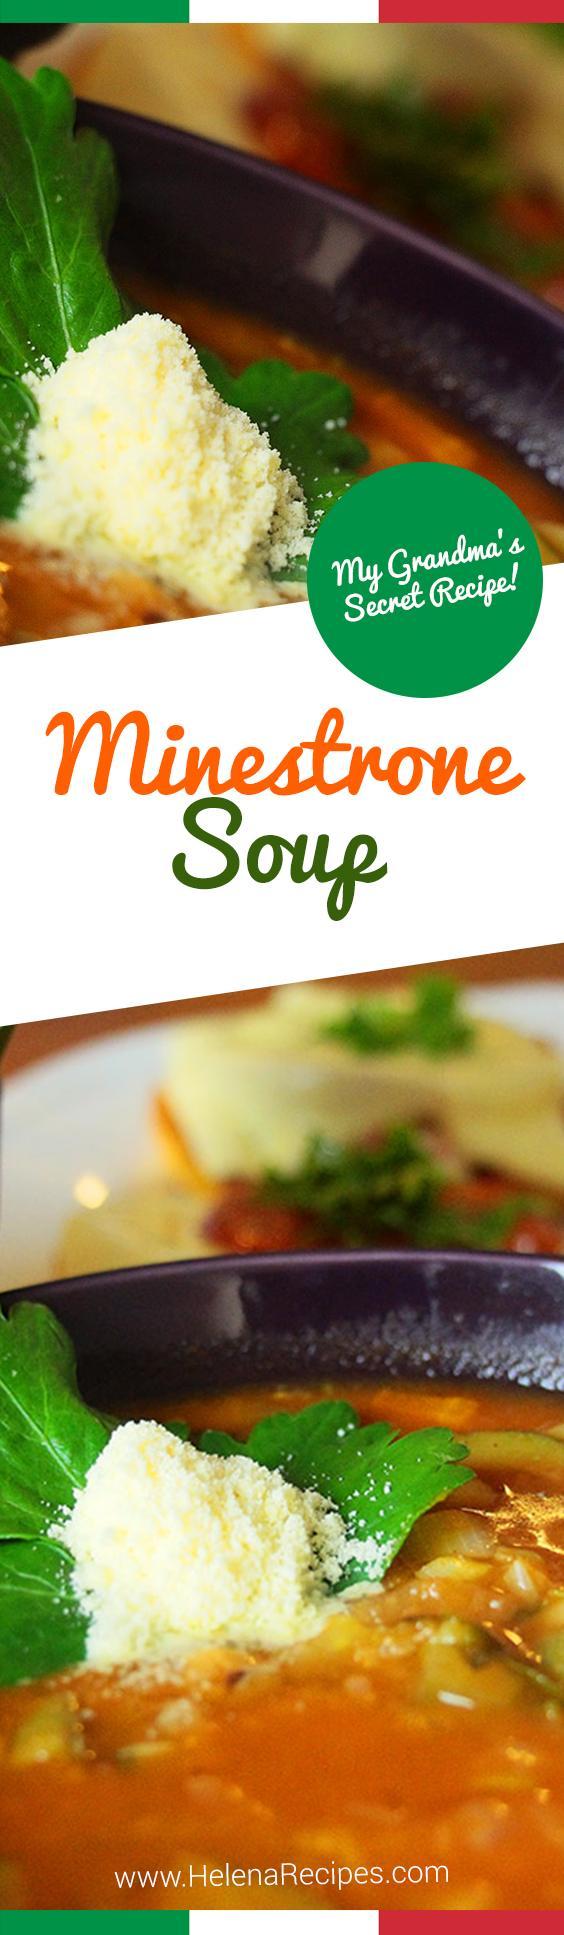 Minestrone-Soup-Pinterest-Image